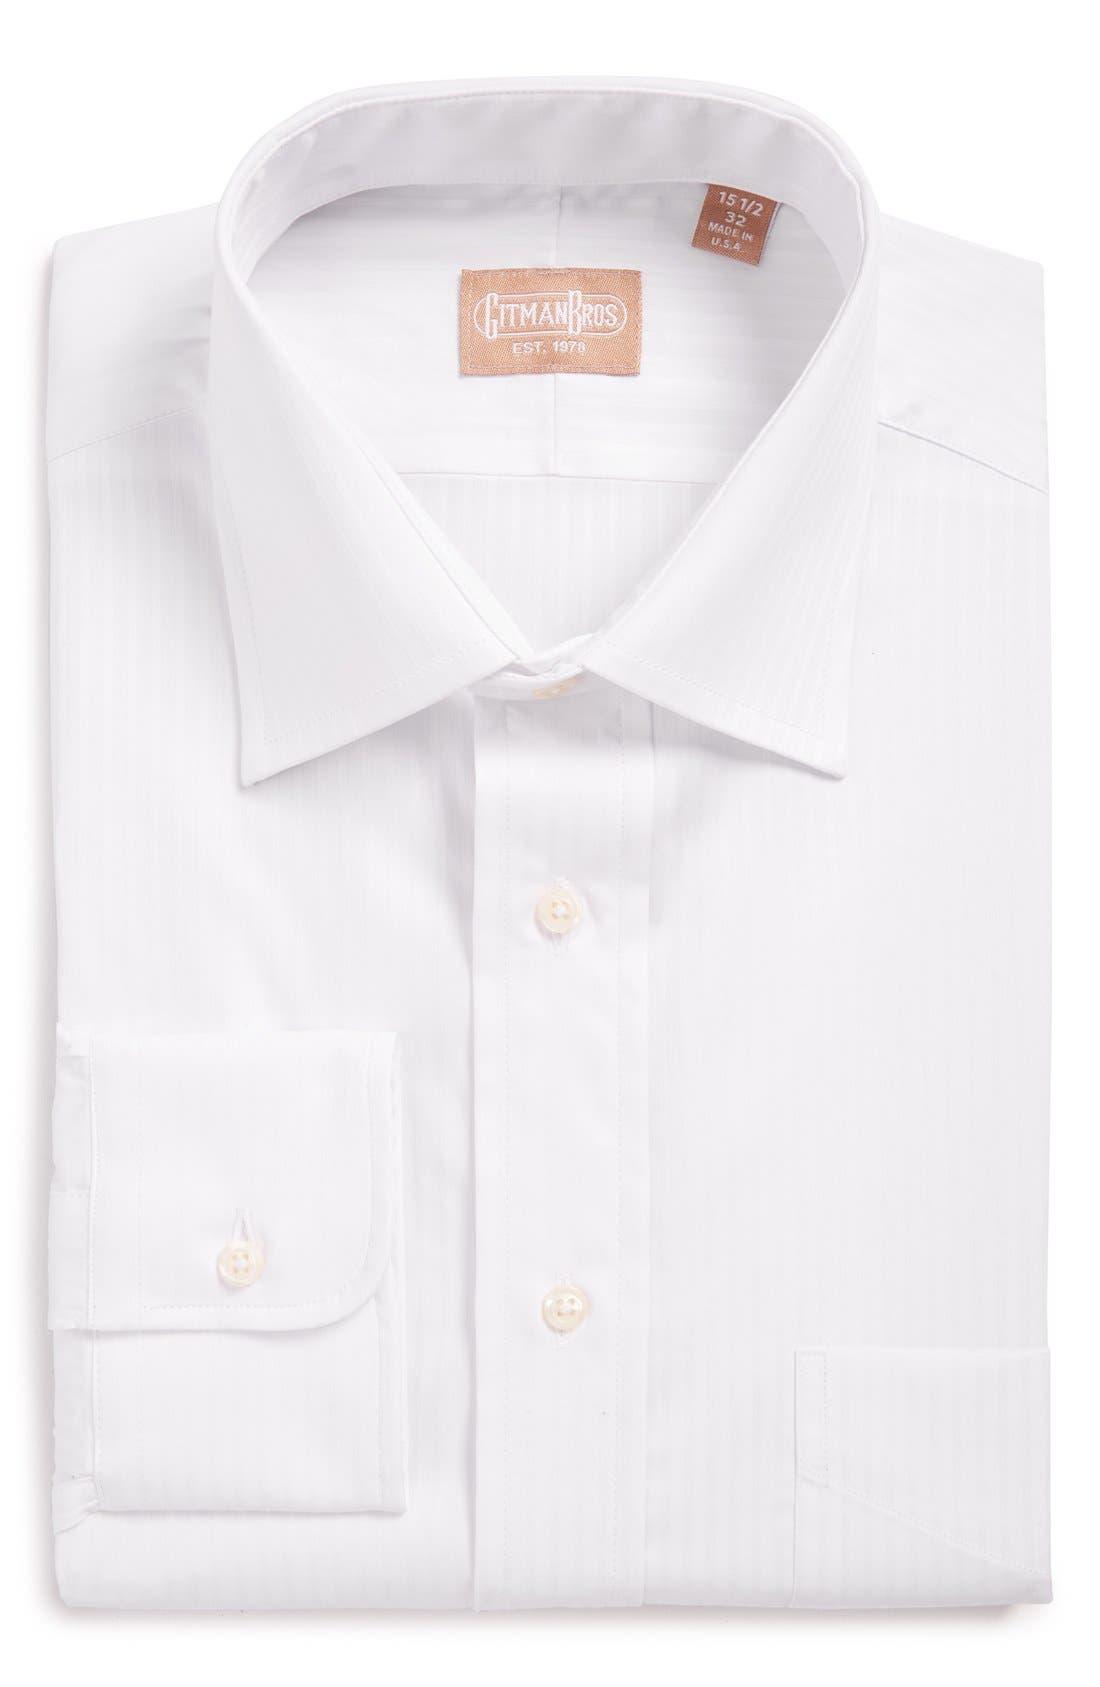 Regular Fit Tonal Stripe Twill Dress Shirt,                             Alternate thumbnail 3, color,                             100